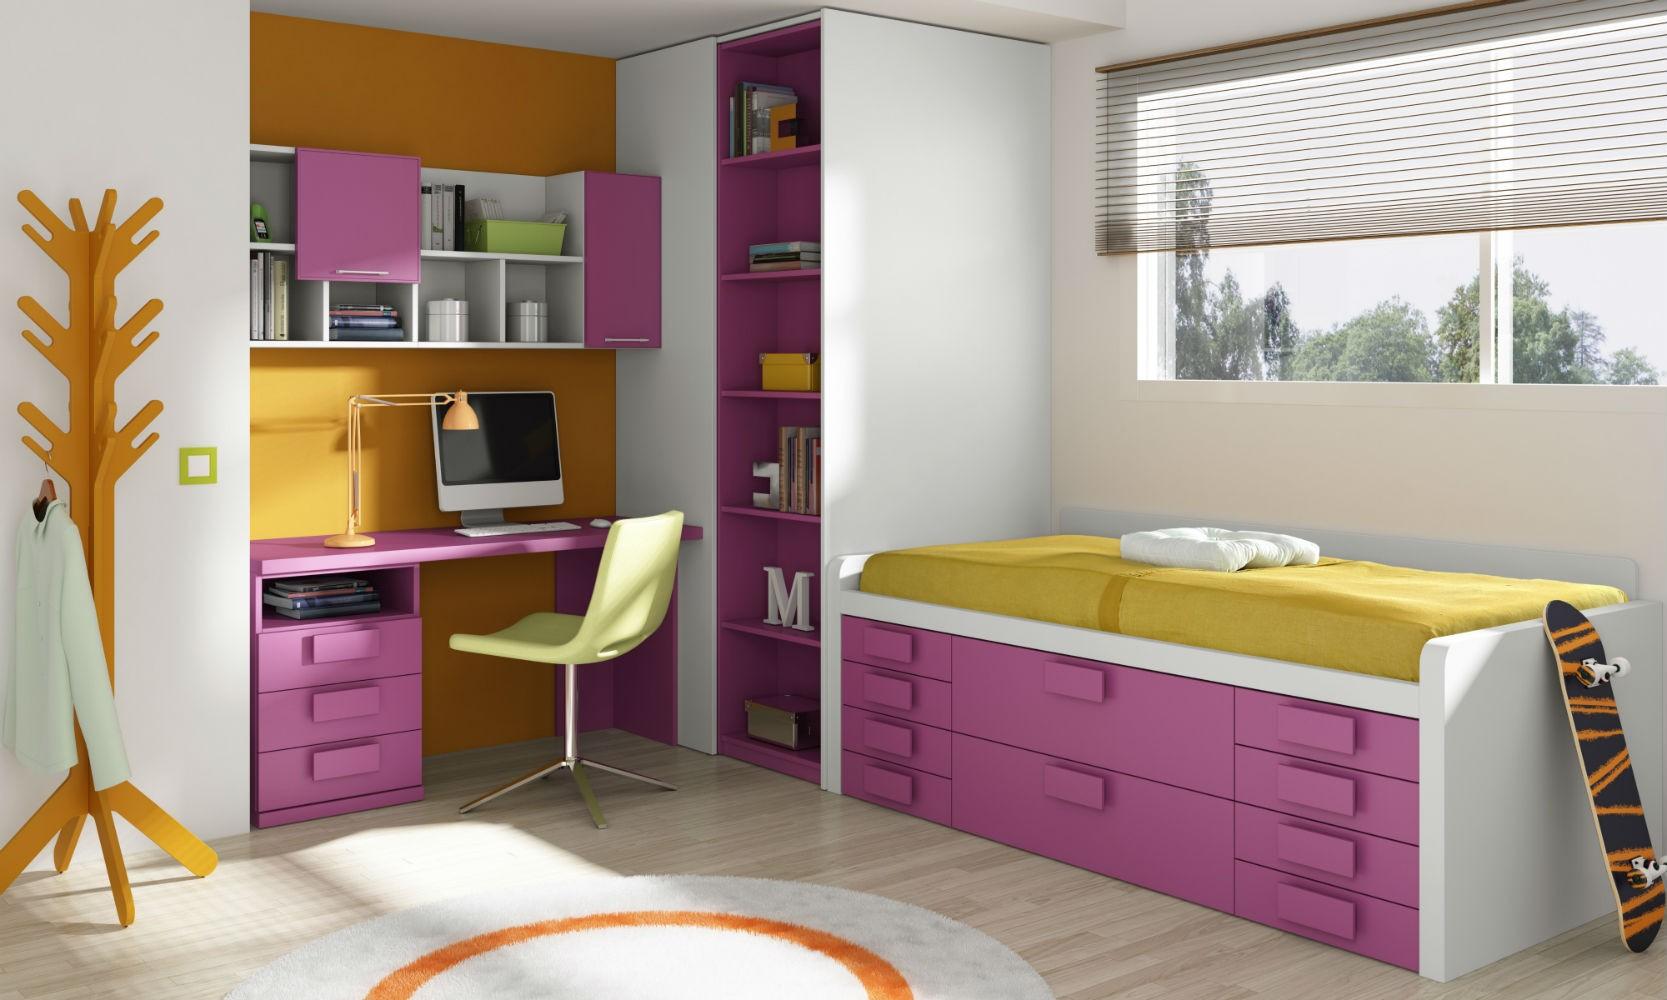 Dormitorio infantil juvenil moderno  Muebles Valencia